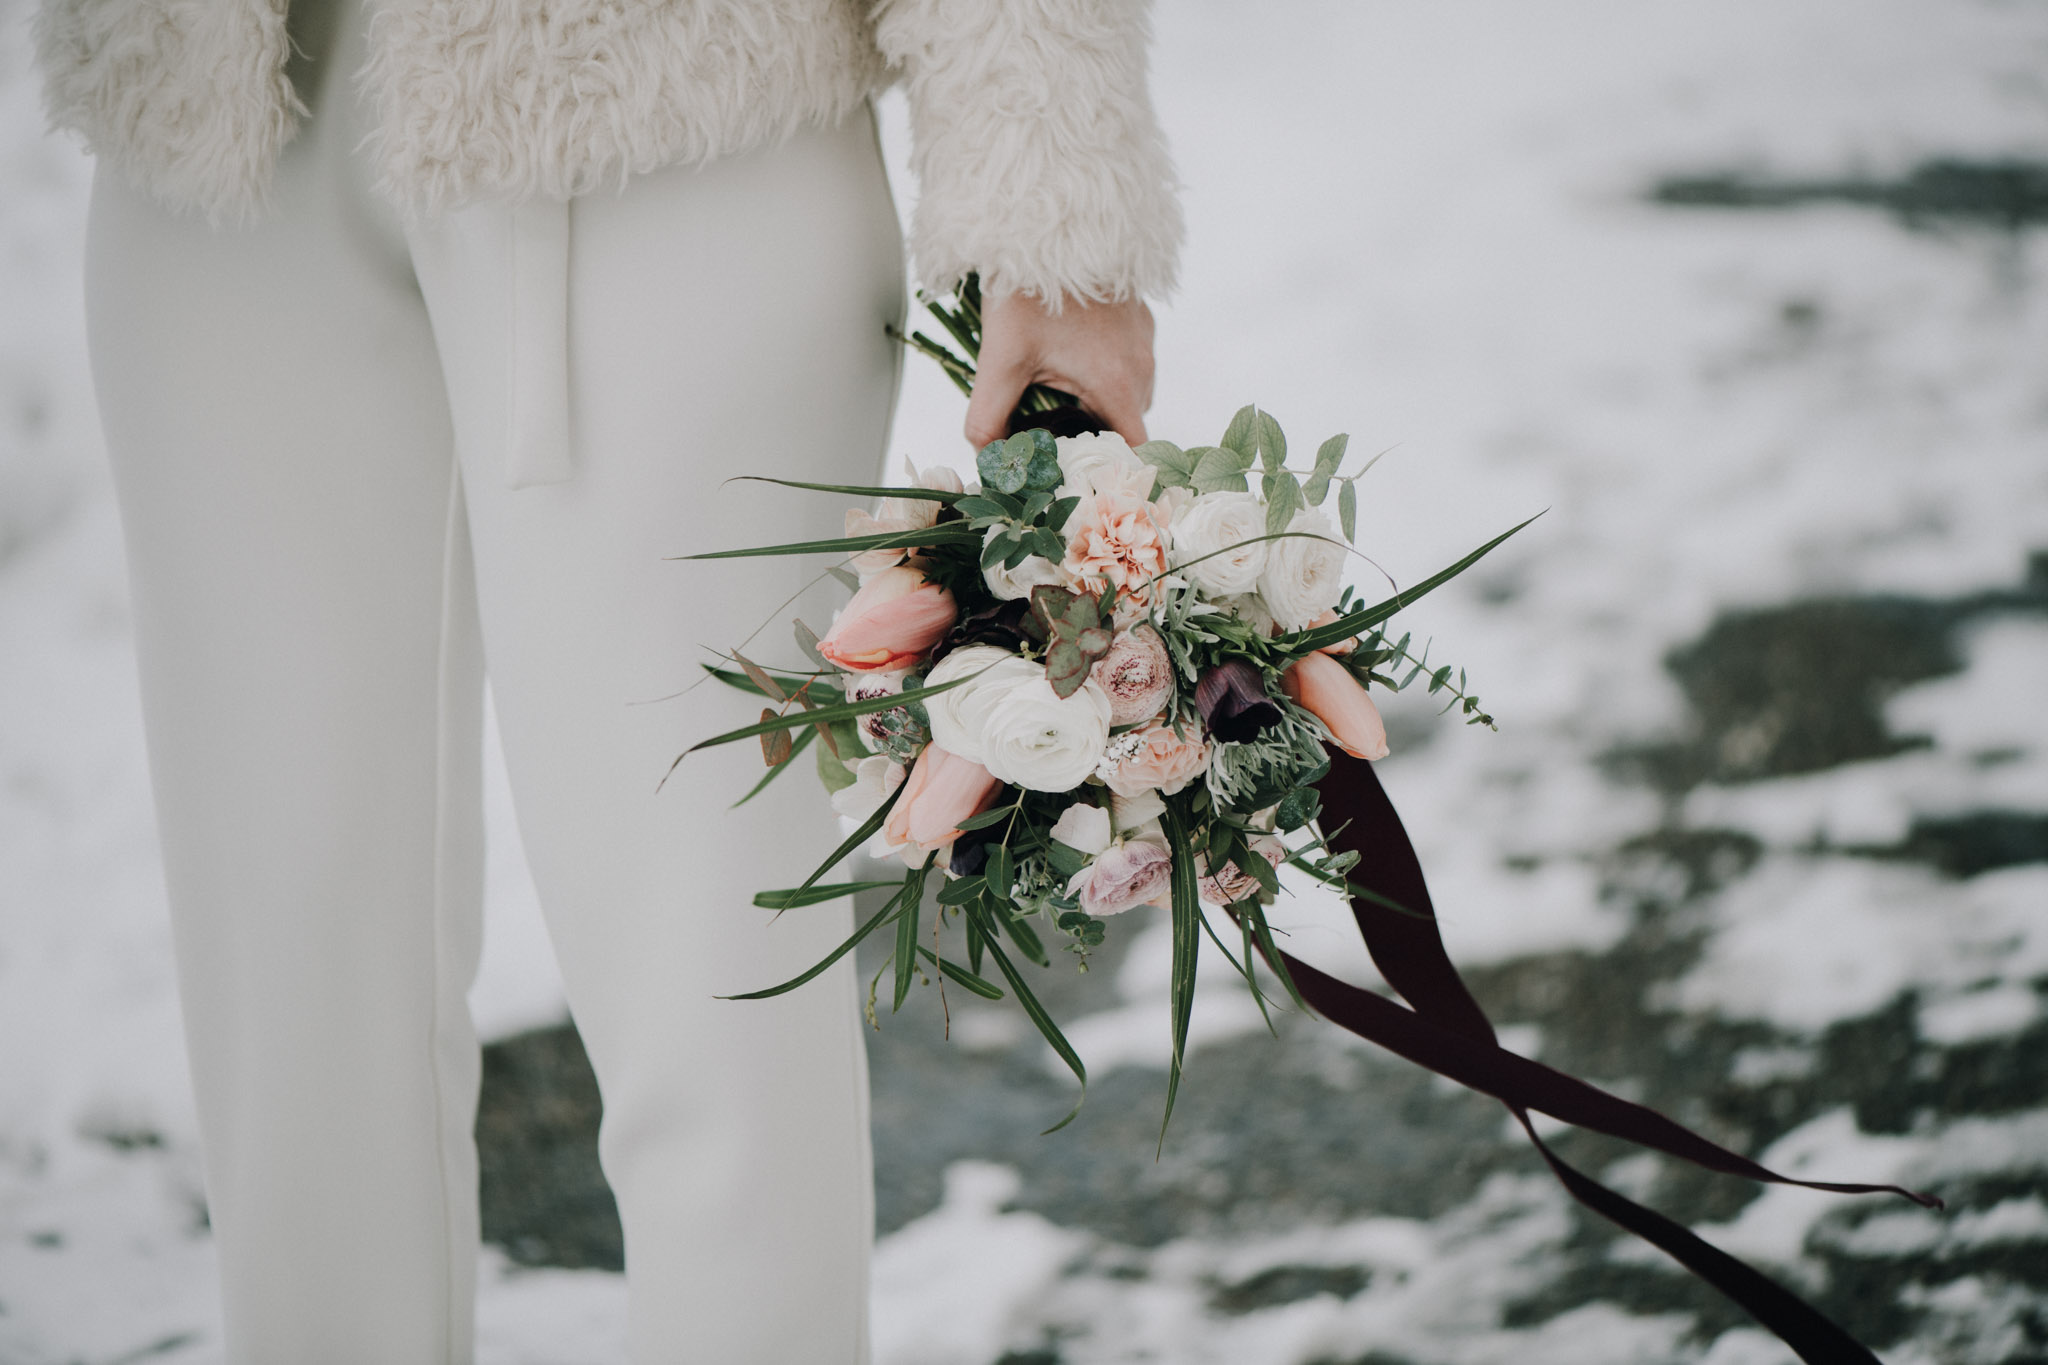 2018-02-03 - LD8_4589 - photographe - mariage - www.lauriediazwedding.com.jpg